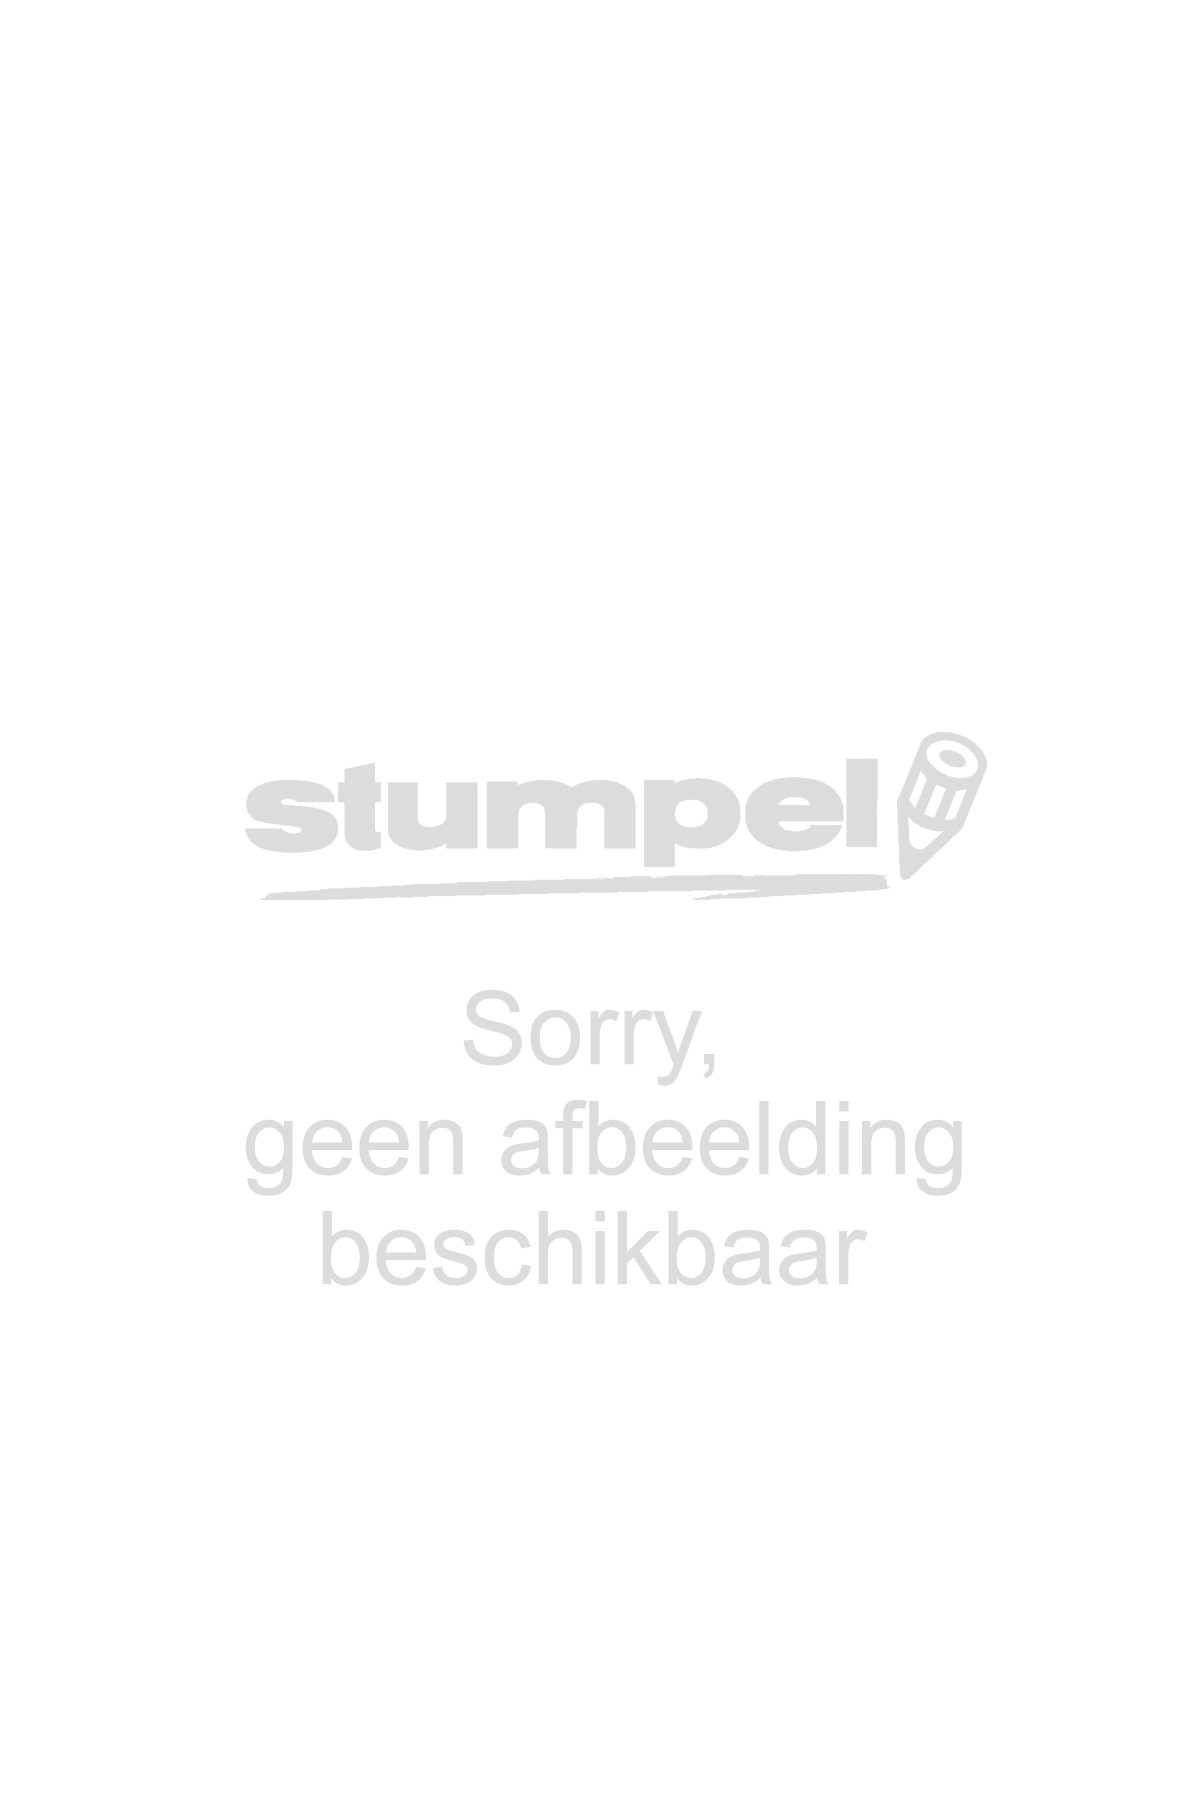 agenda-2021-ryam-memoplan-7-staand-wit-nl-suprema-zwart-11010975